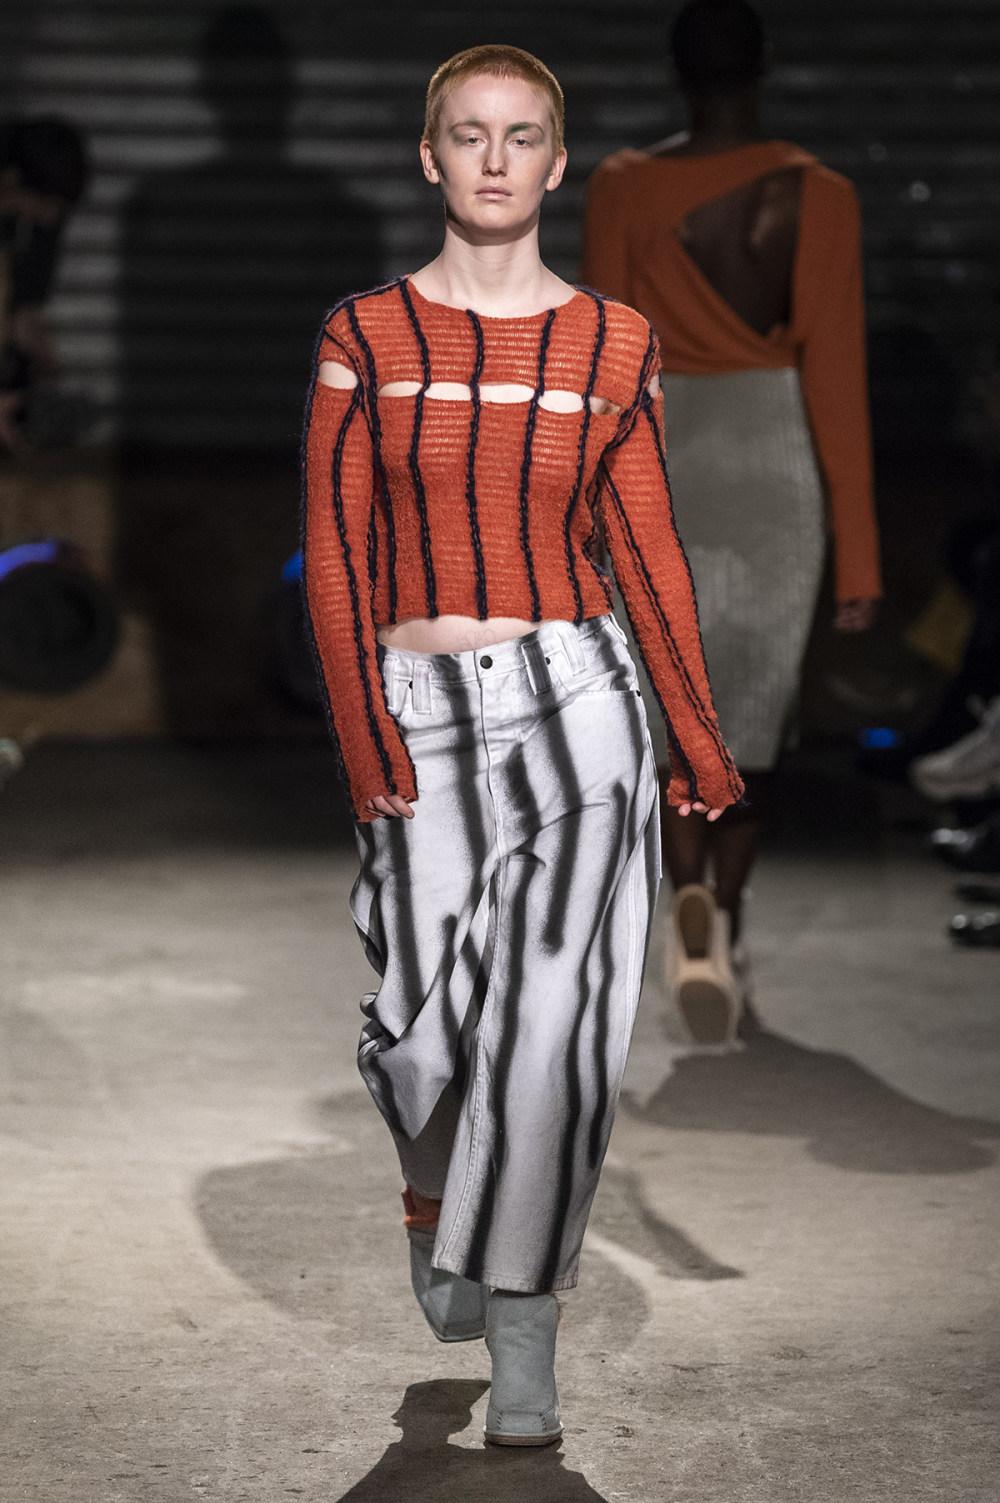 Eckhaus Latta时装系列采用了更加结构化的剪裁和图案提花-20.jpg